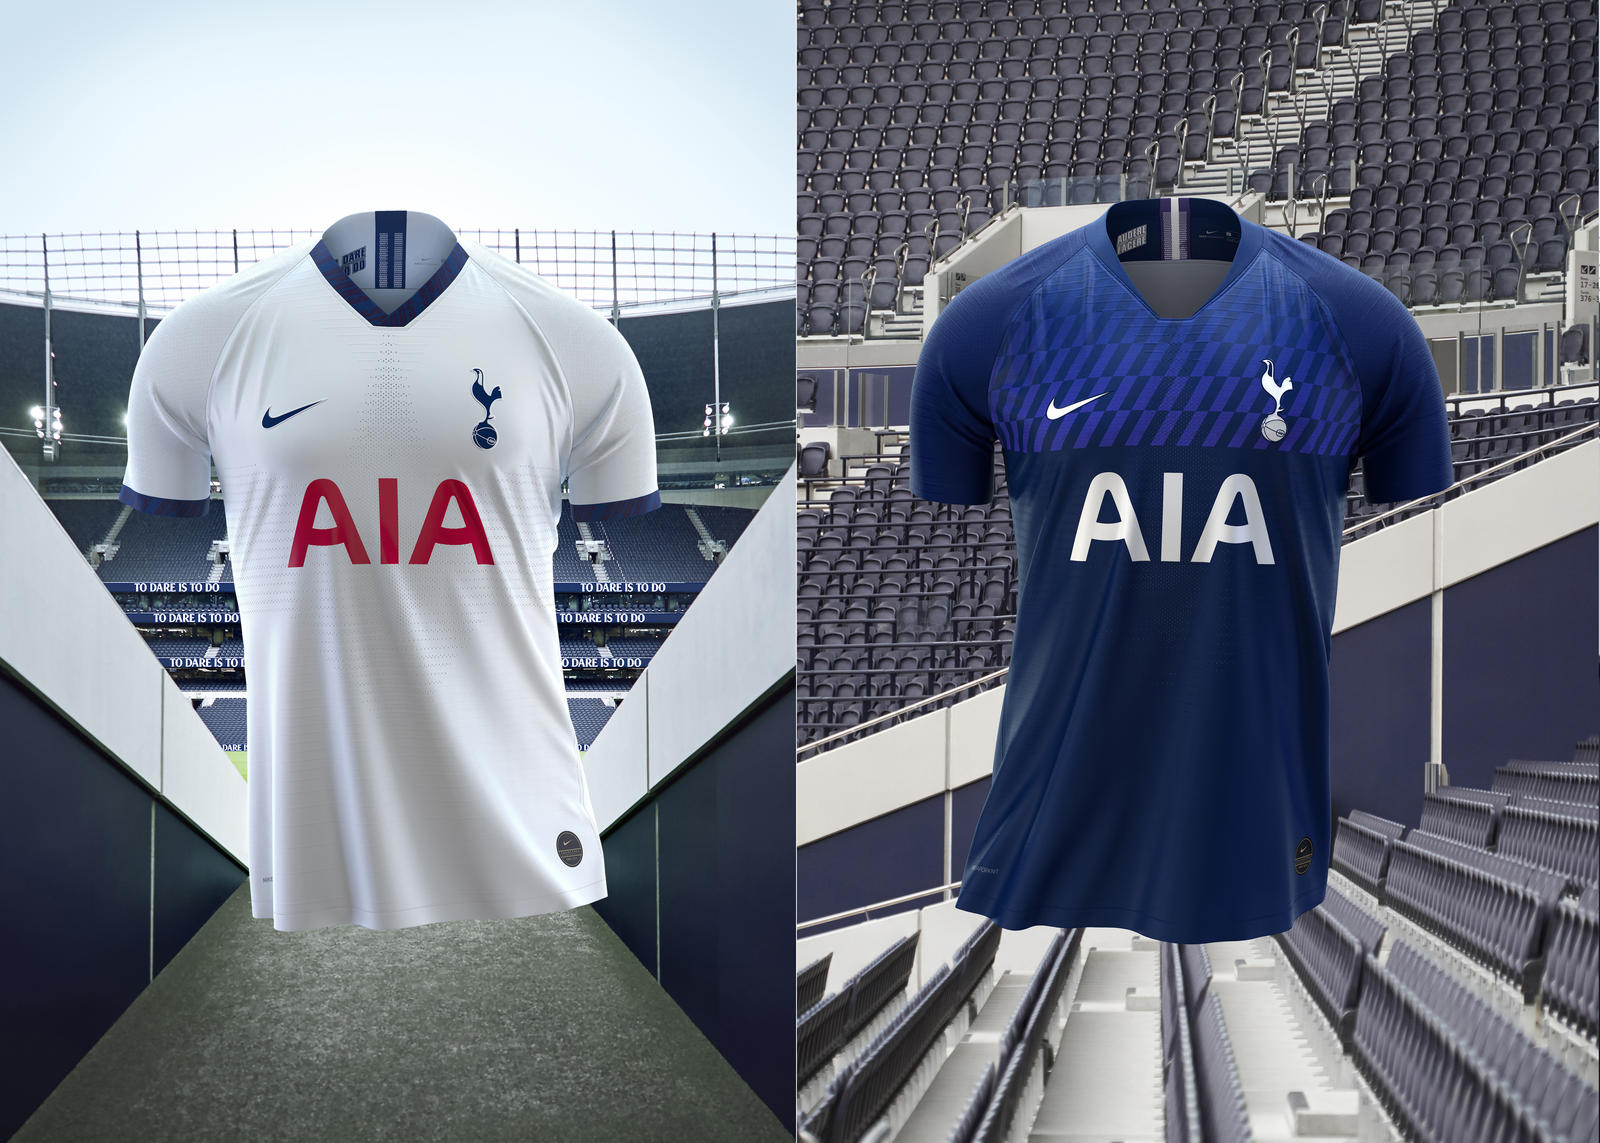 cdd8ddaca470b Tottenham Home and Away Kits 2019-20 - Nike News